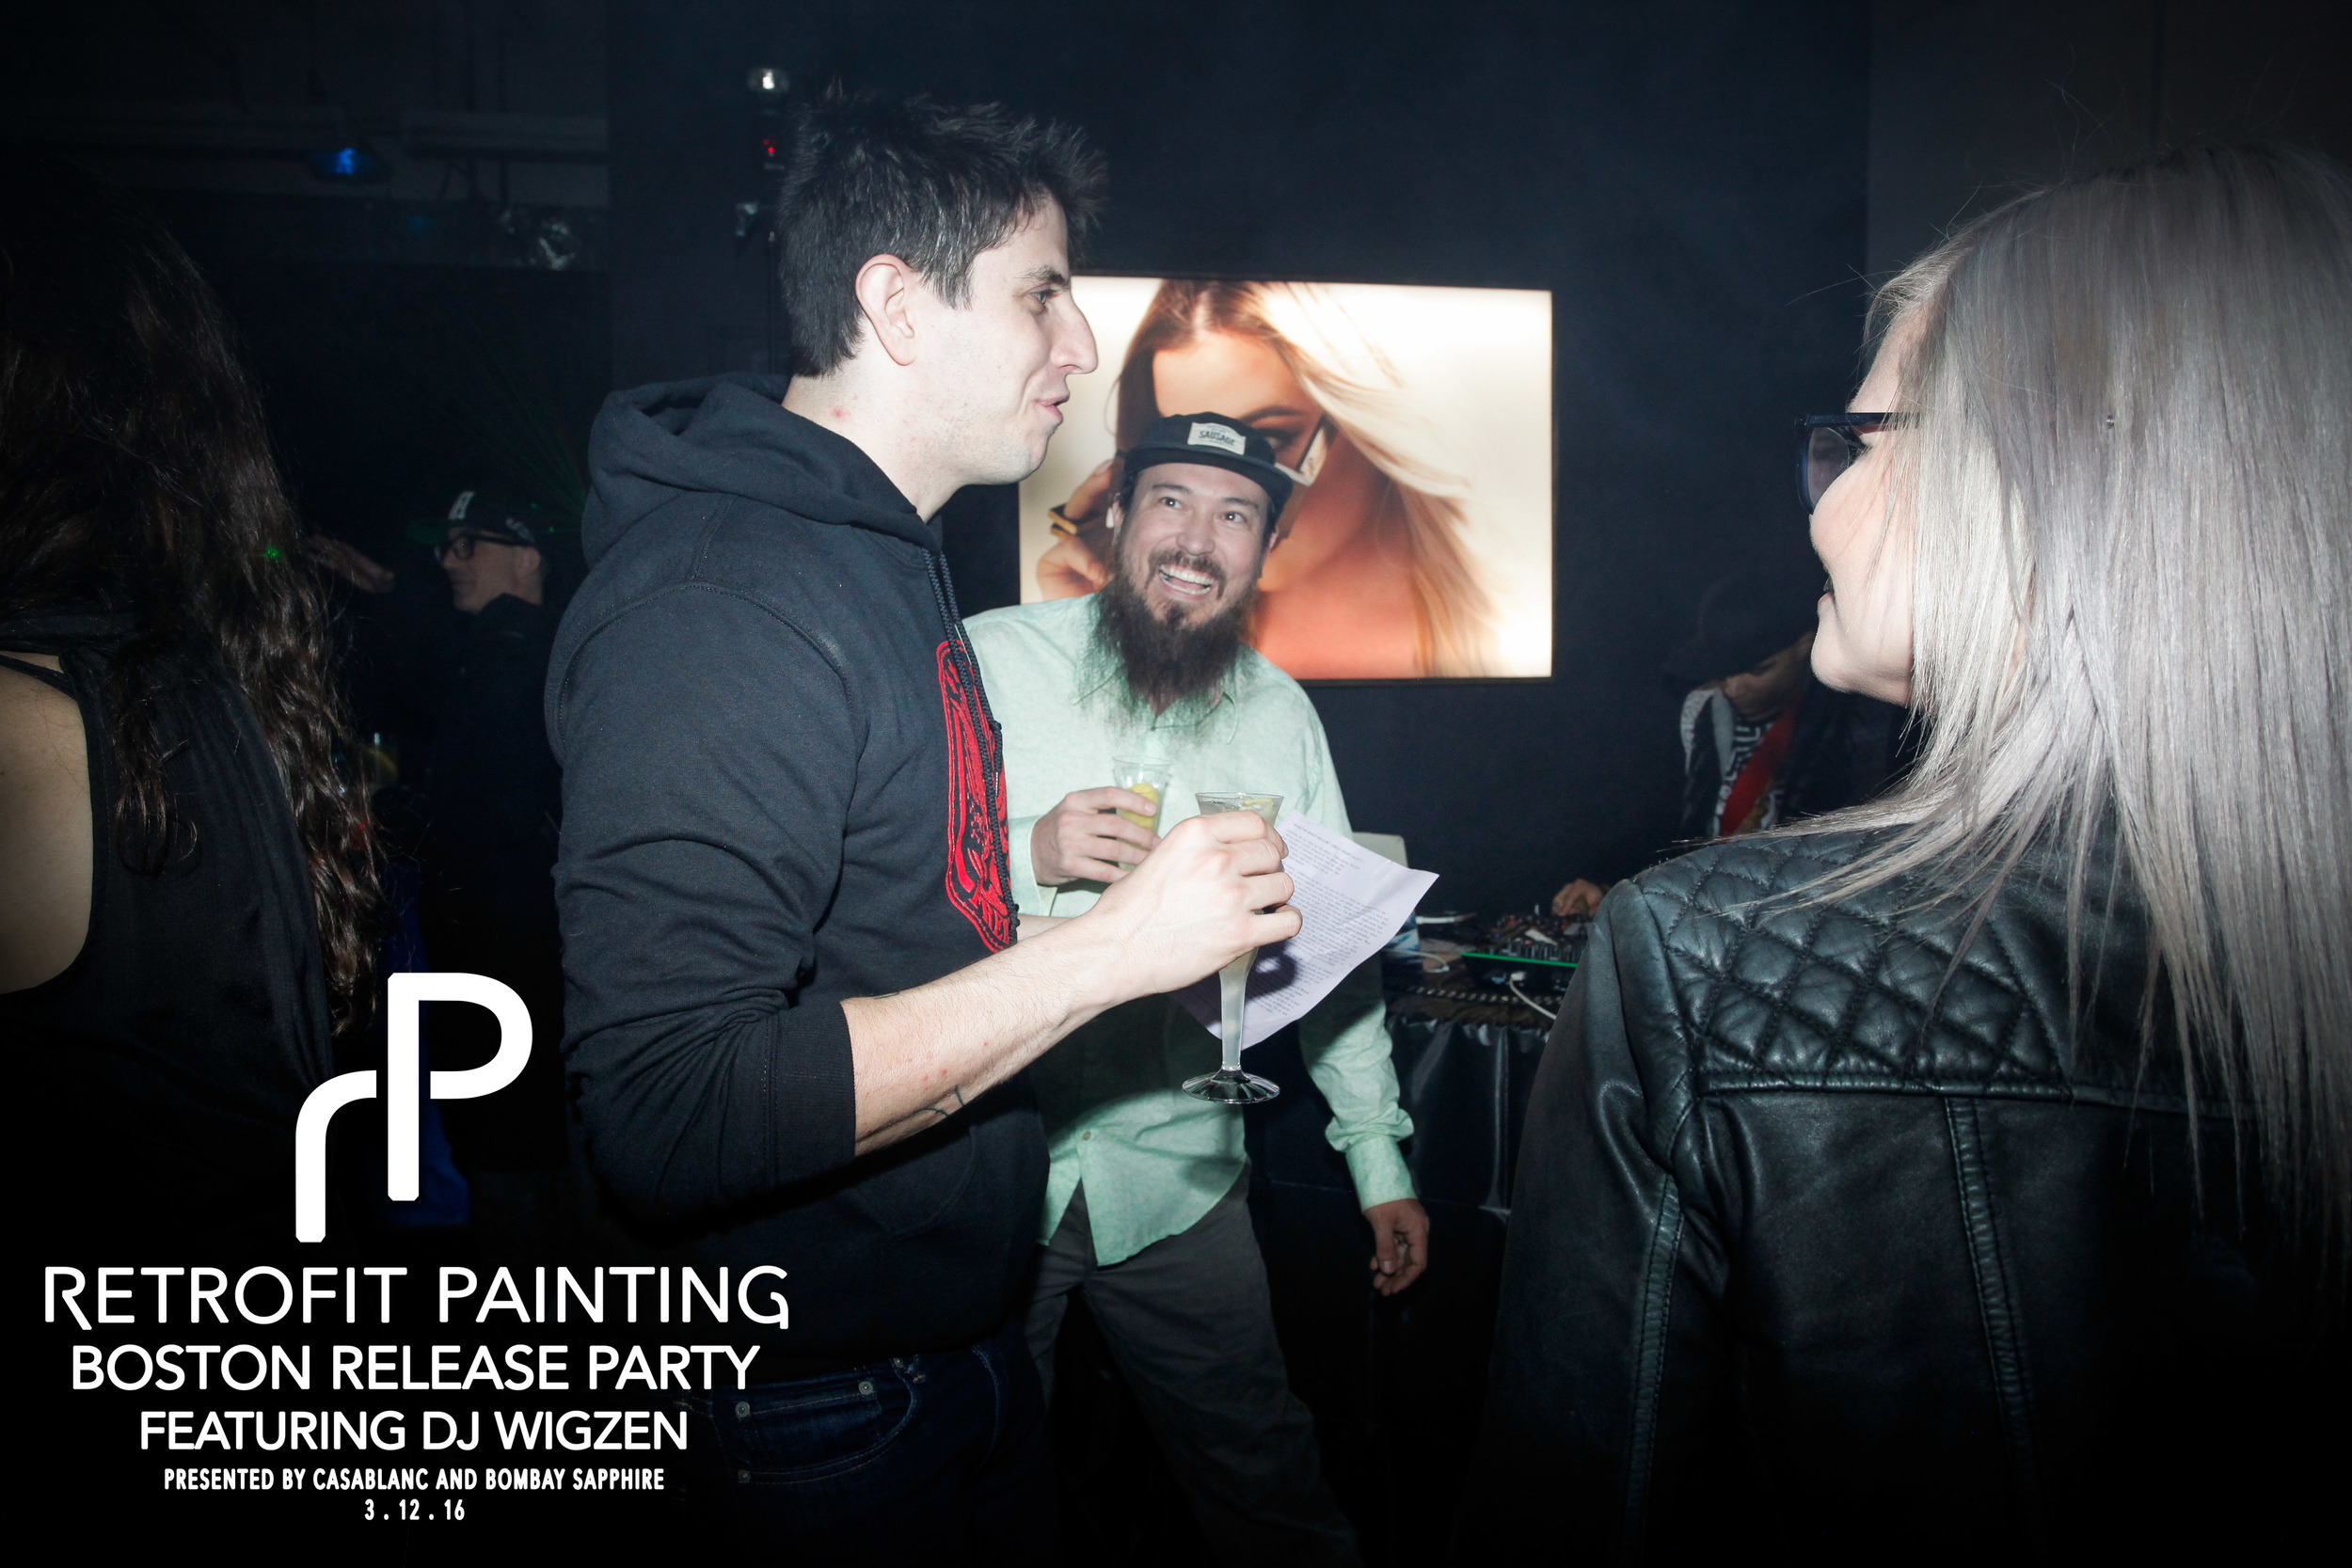 Retrofit Painting Boston Release Party 0032.jpg